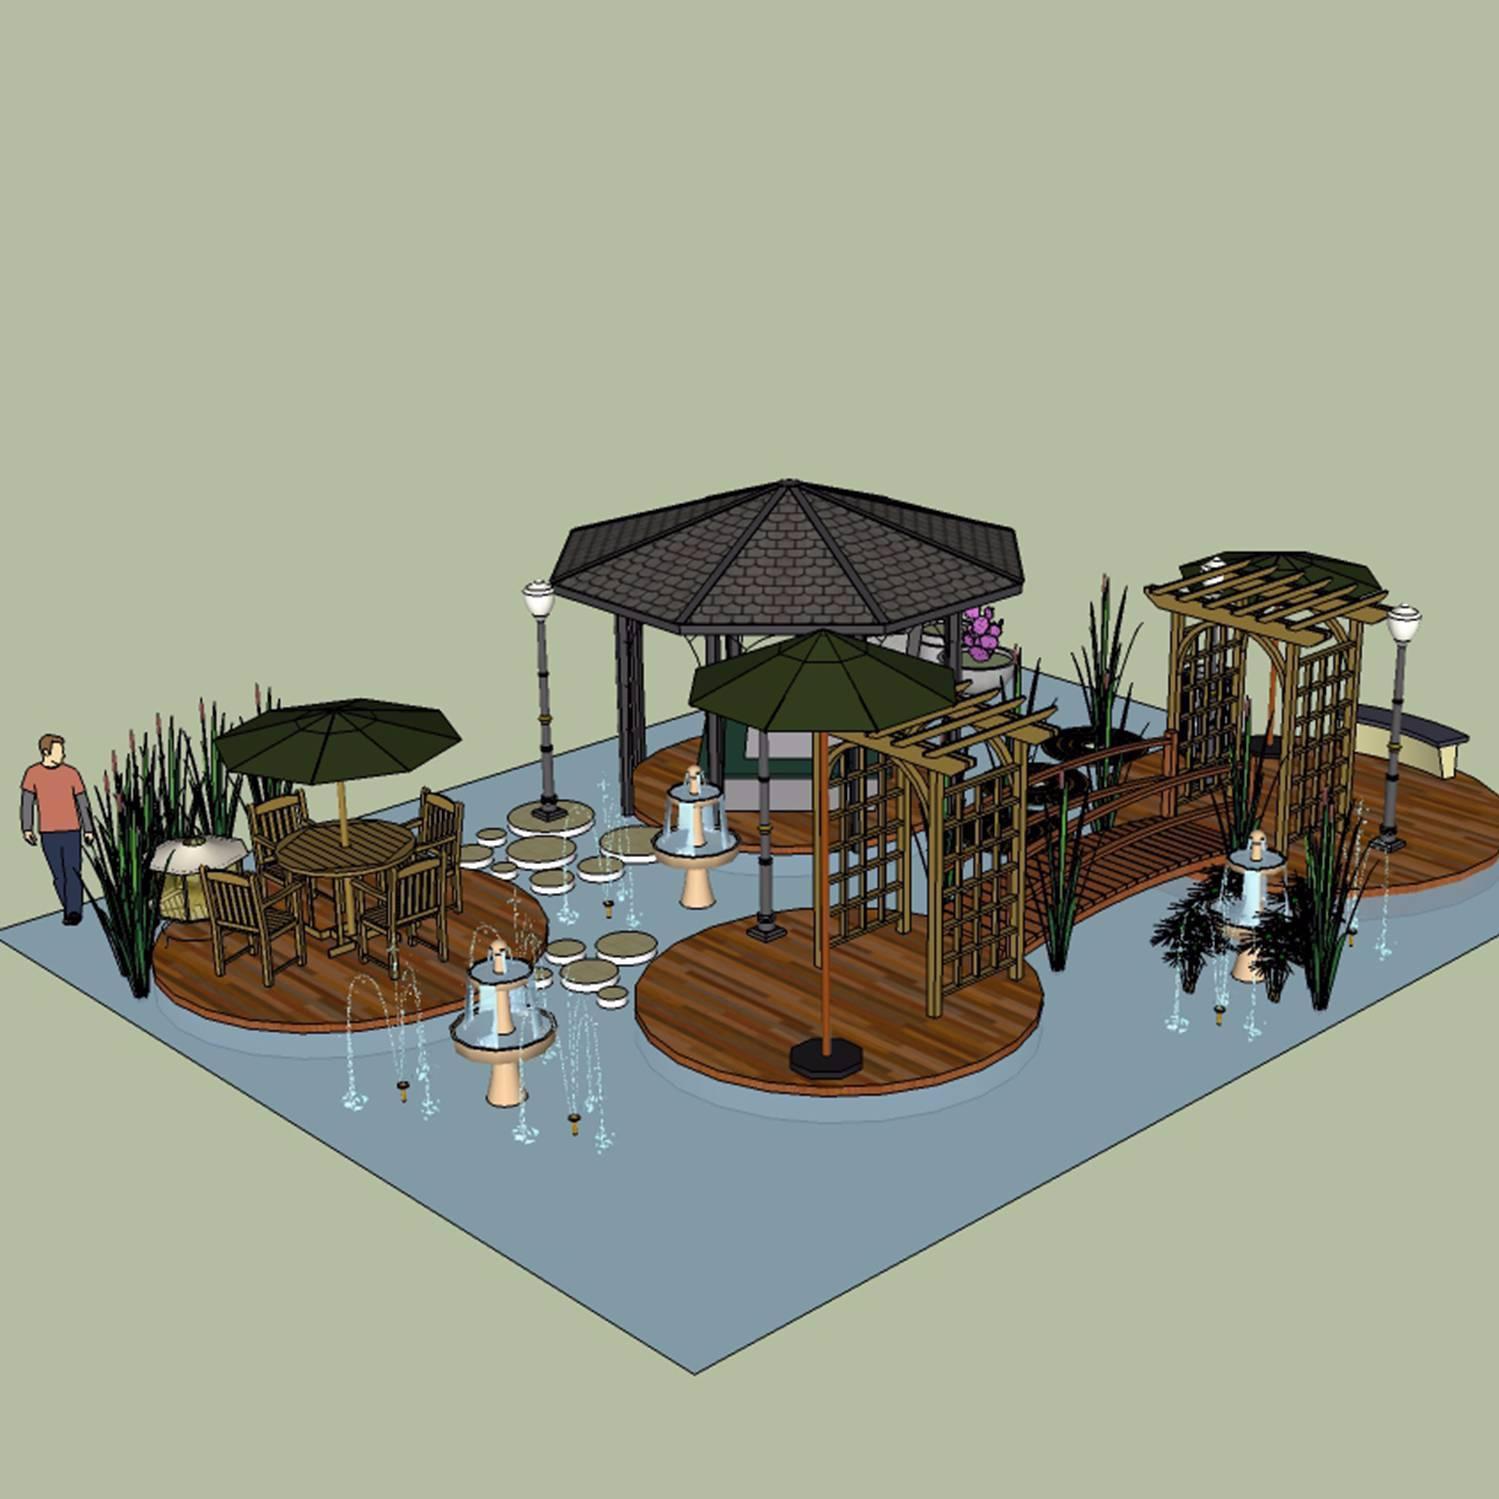 花园景观su模型